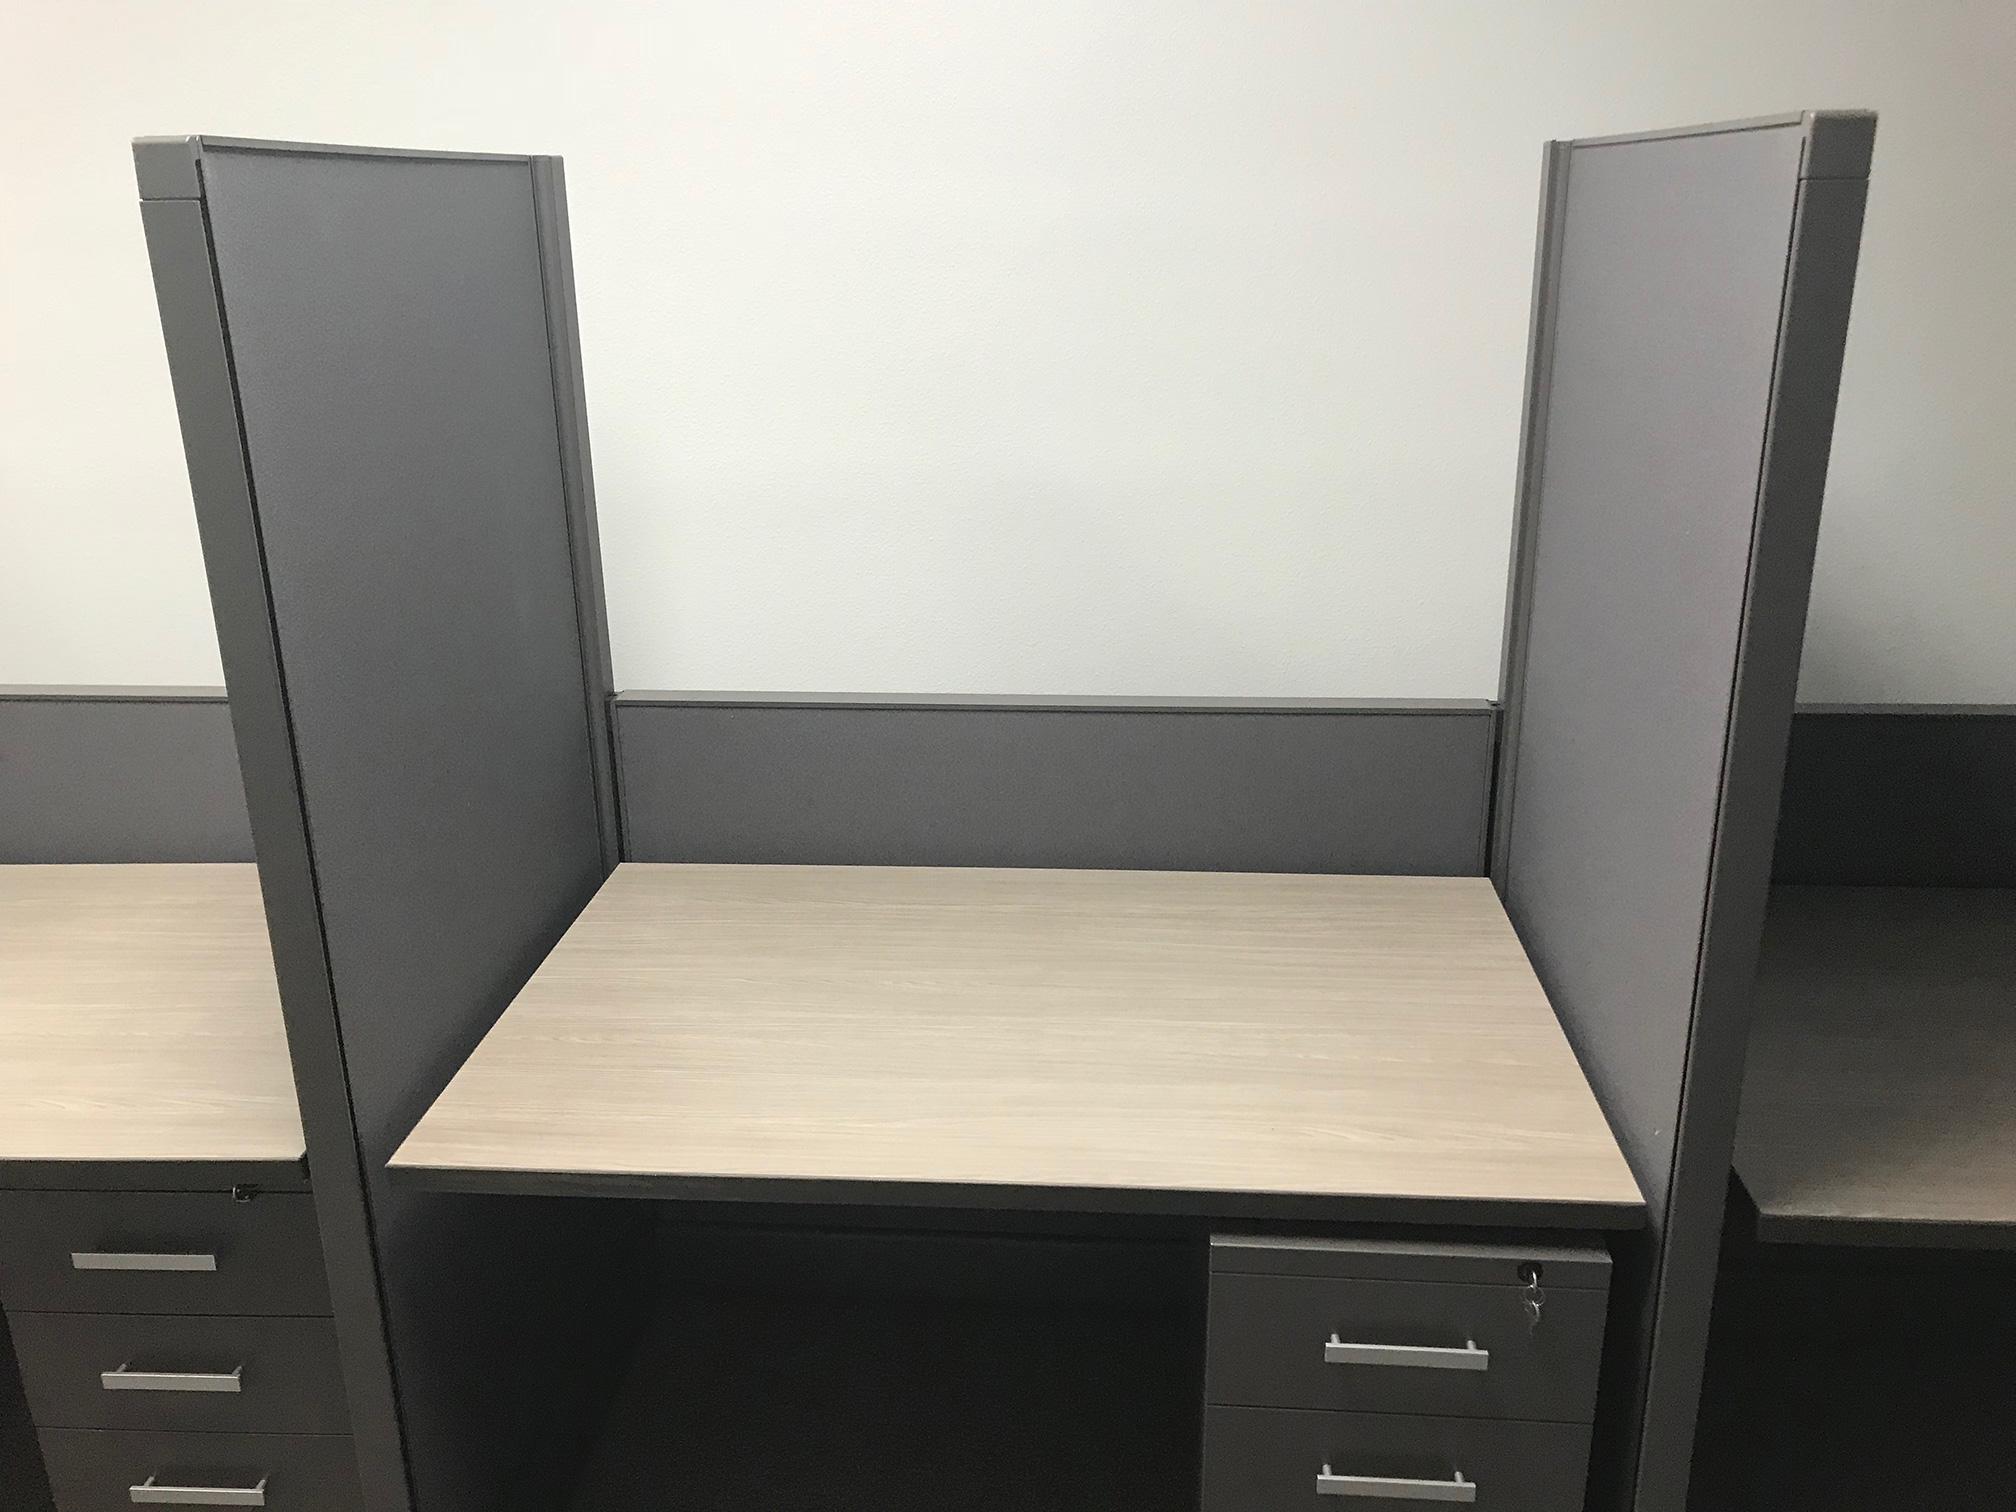 call-center-cubicles-florida-manasota-office-supplies-llc.jpg